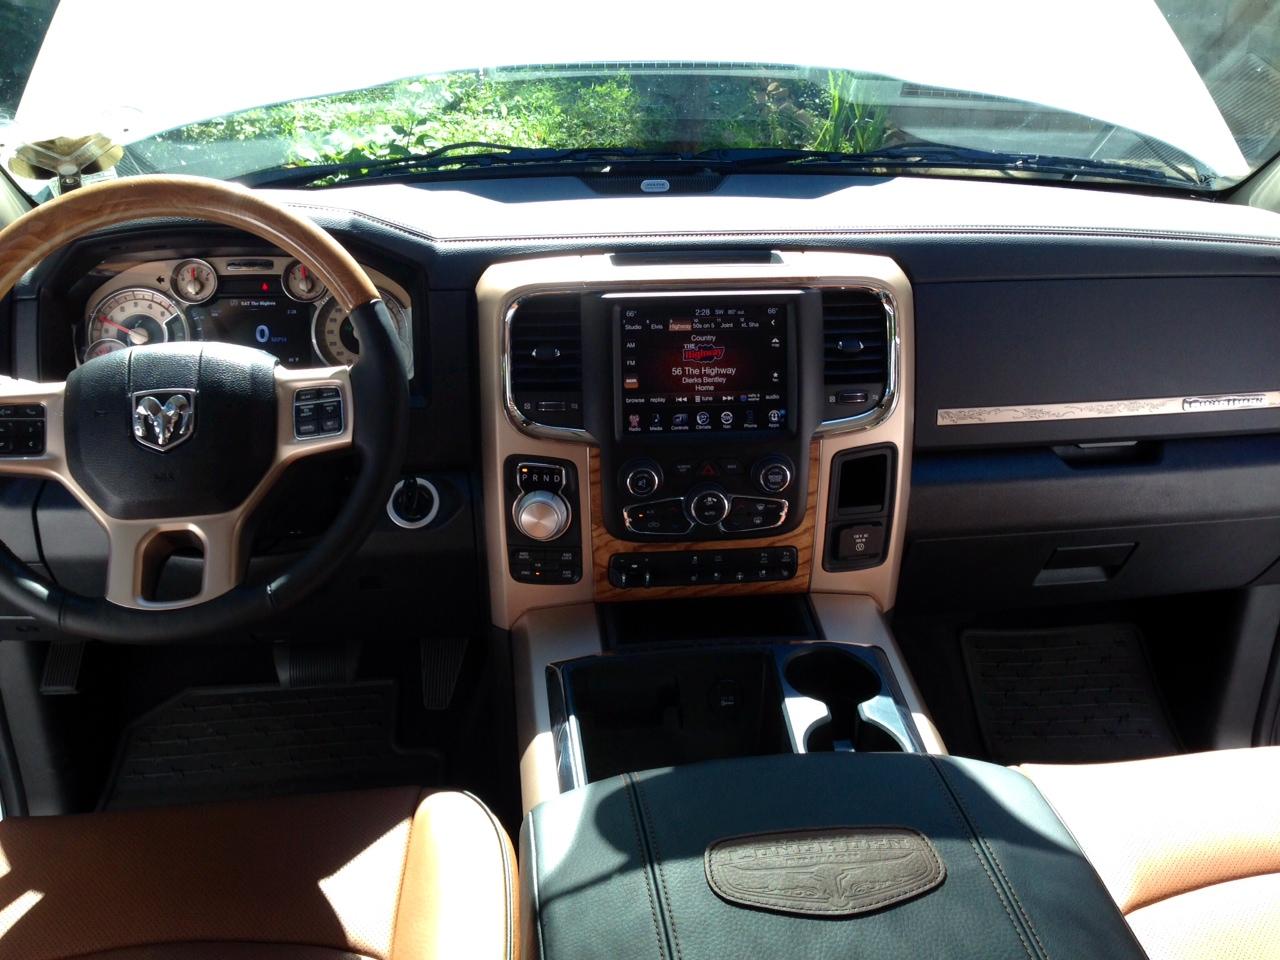 Ram Promaster 4X4 >> FS: 2014 Ram 1500 EcoDiesel 4x4 Laramie Longhorn Short Bed ...